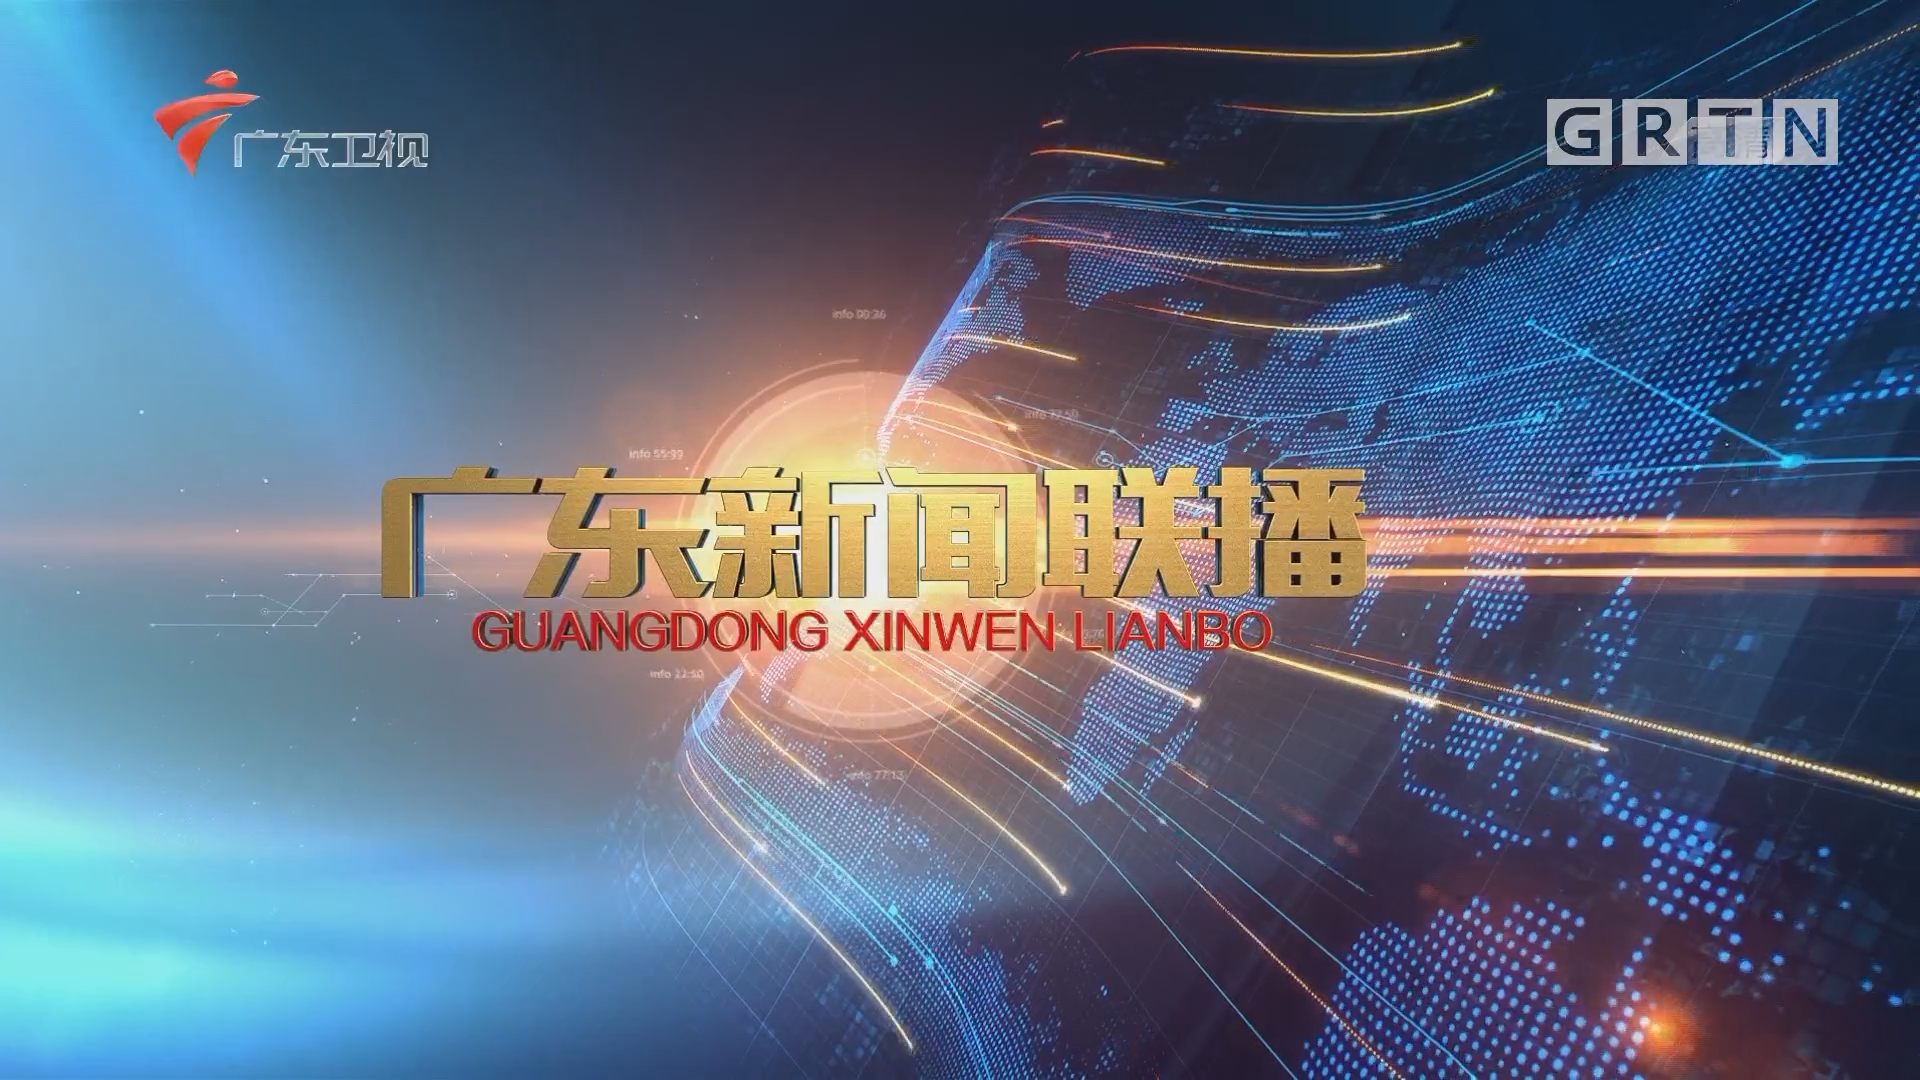 [HD][2018-02-17]广东新闻联播:震撼!广州史上最大花车巡游花城